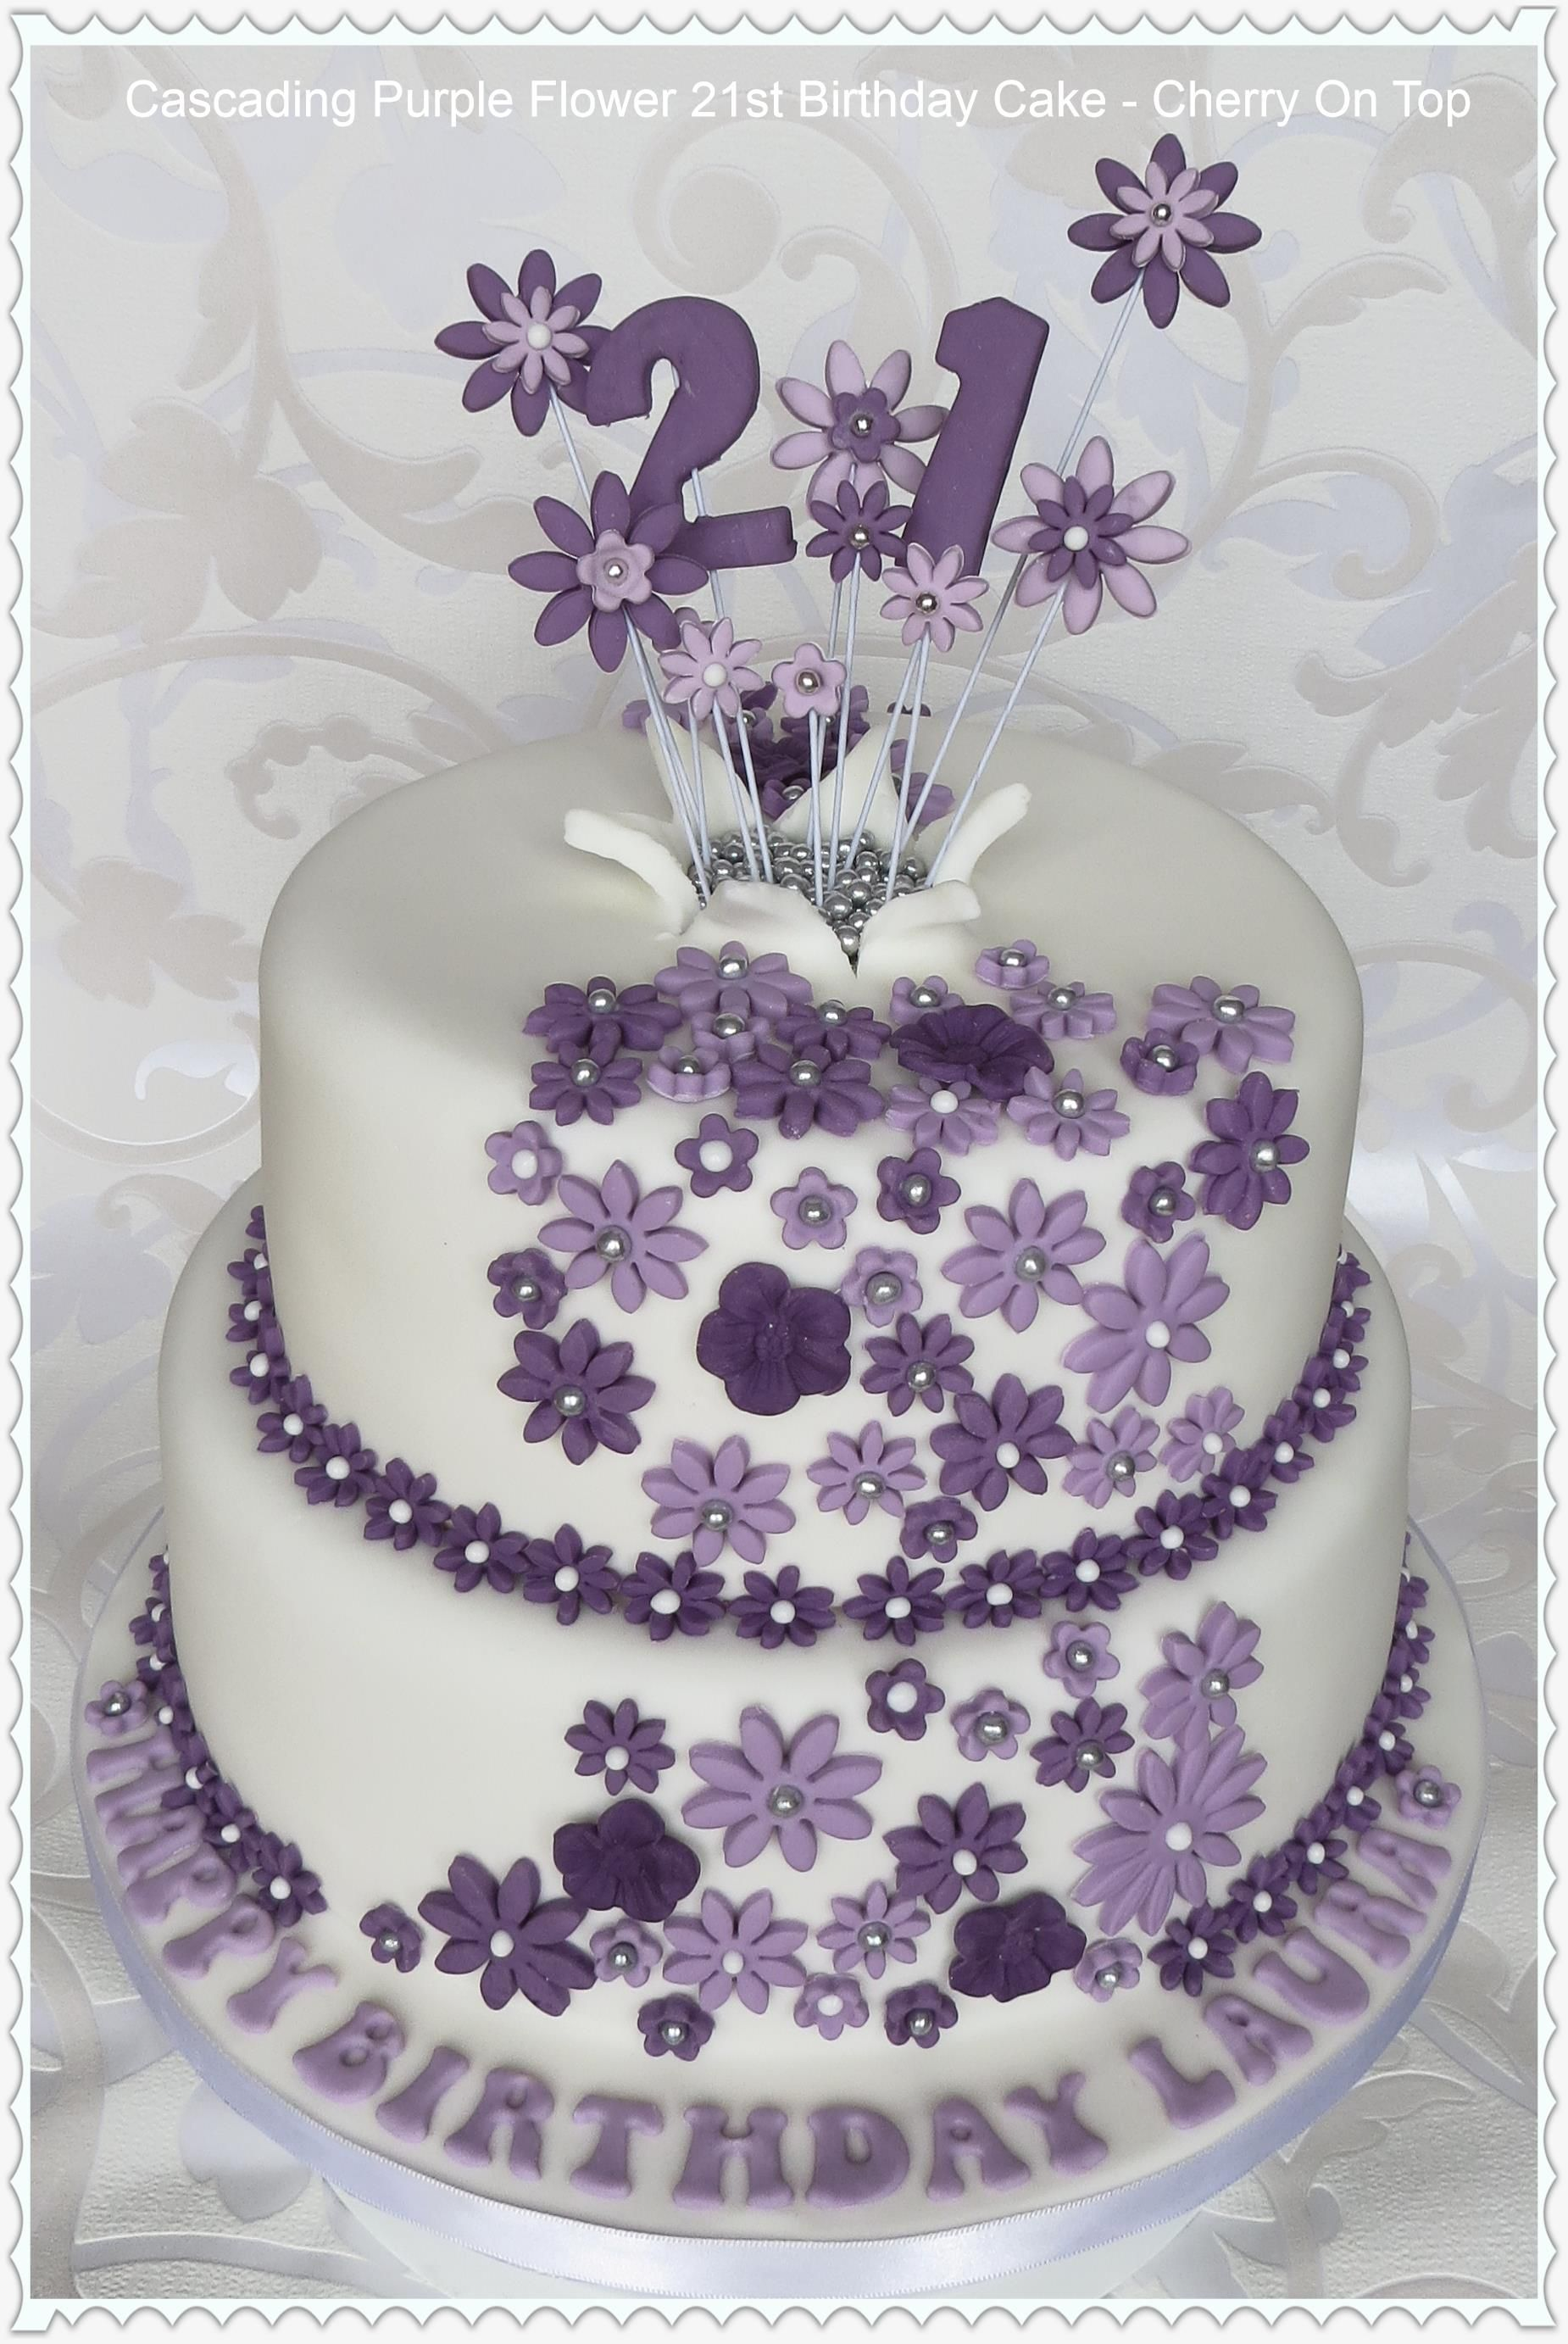 Cascading purple flowers 21st birthday cake cakes pinterest cascading purple flowers 21st birthday cake izmirmasajfo Image collections